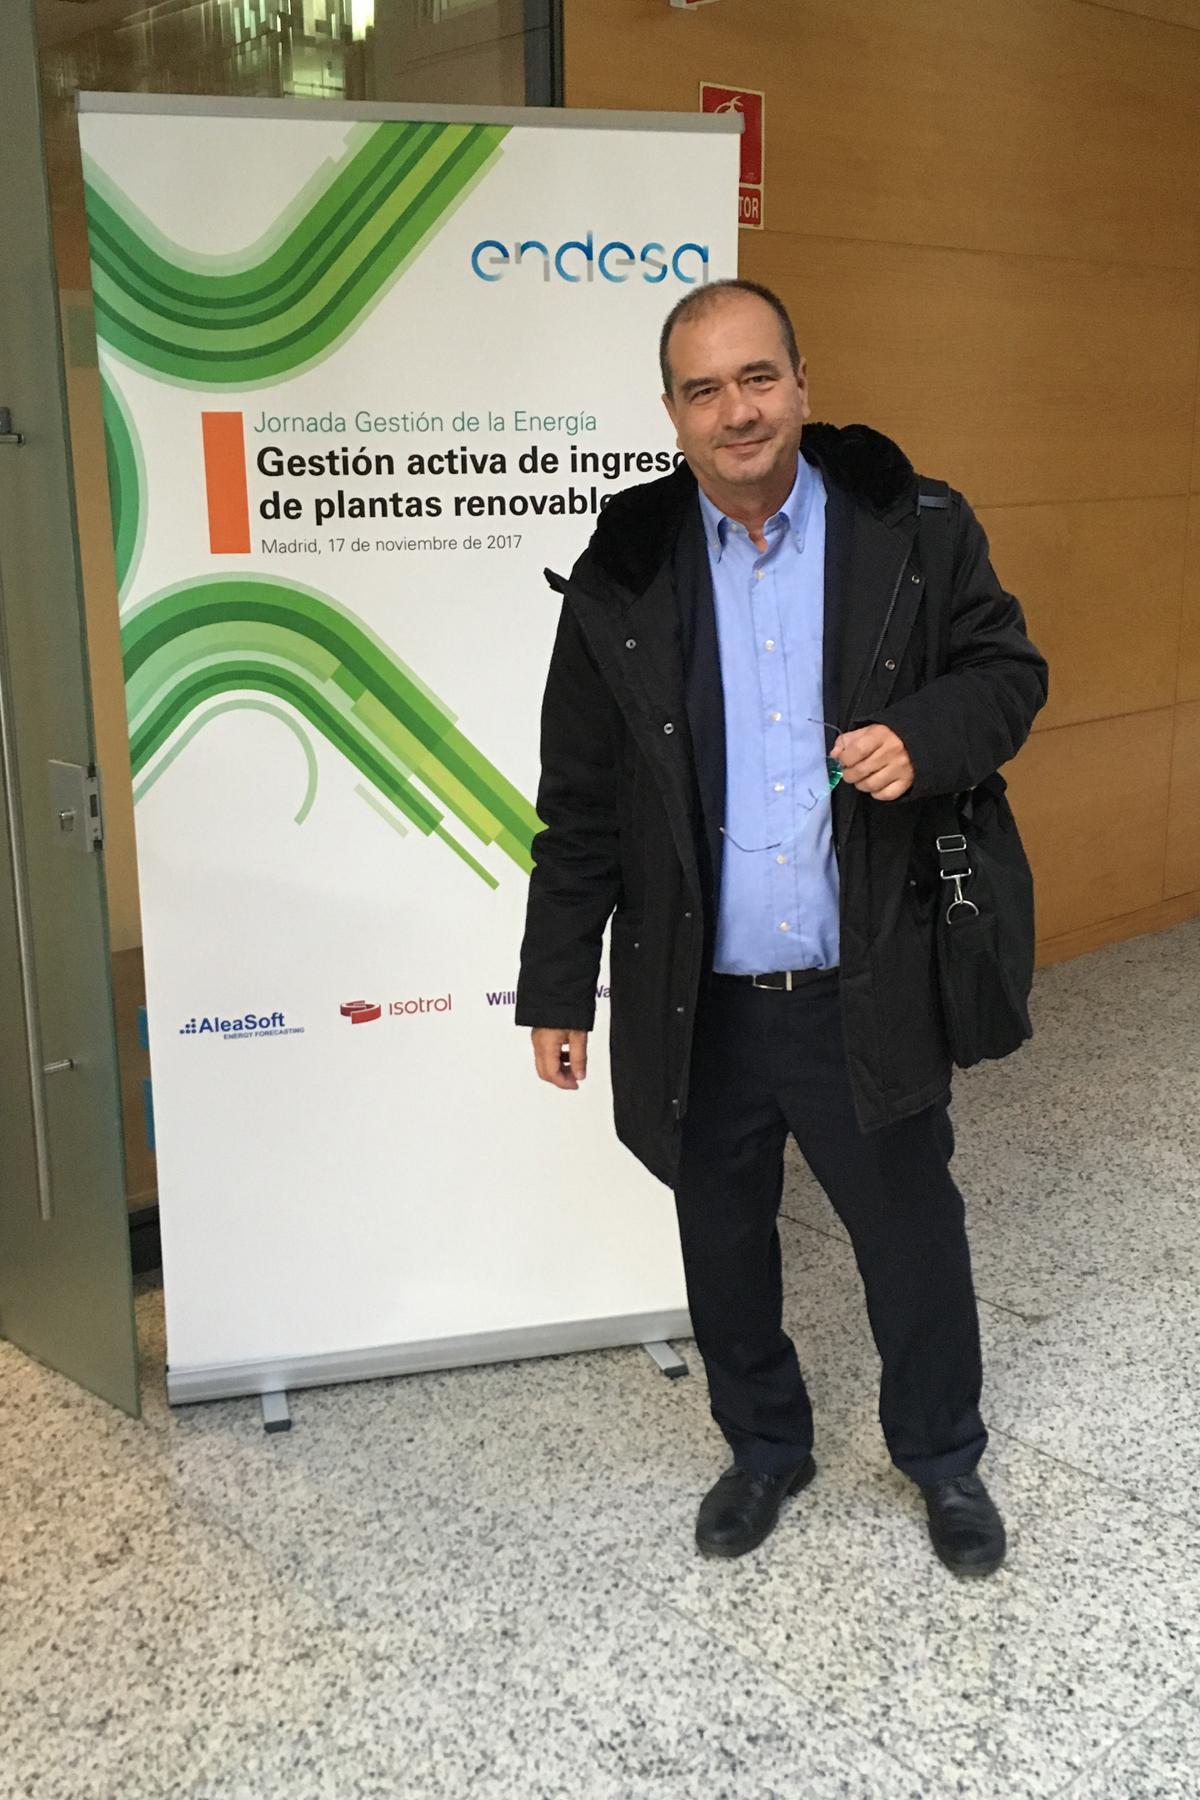 AleaSoft Energy Forecasting Endesa conference